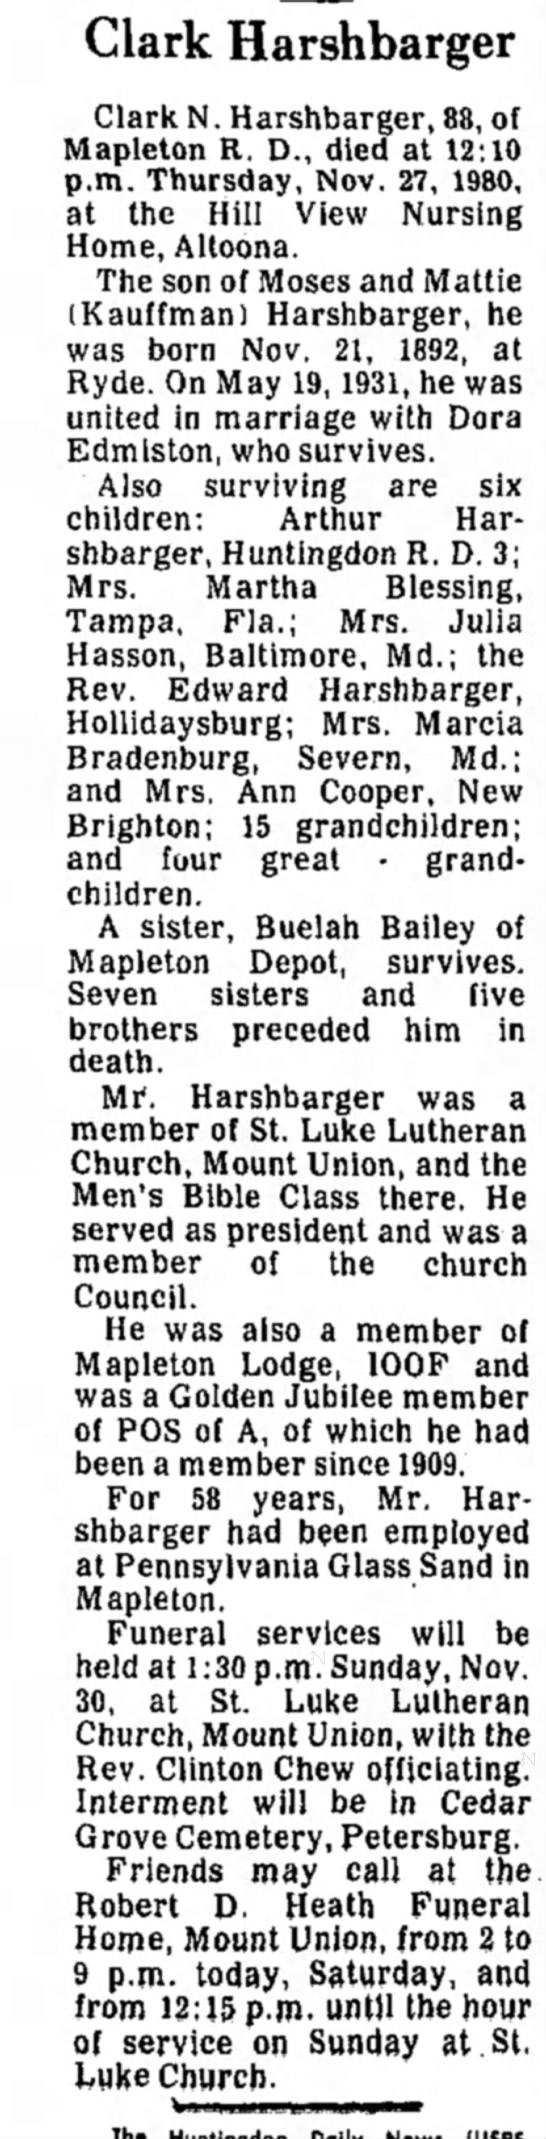 Clark Harshbarger obit-TDN-29 Nov 1980-p5 -